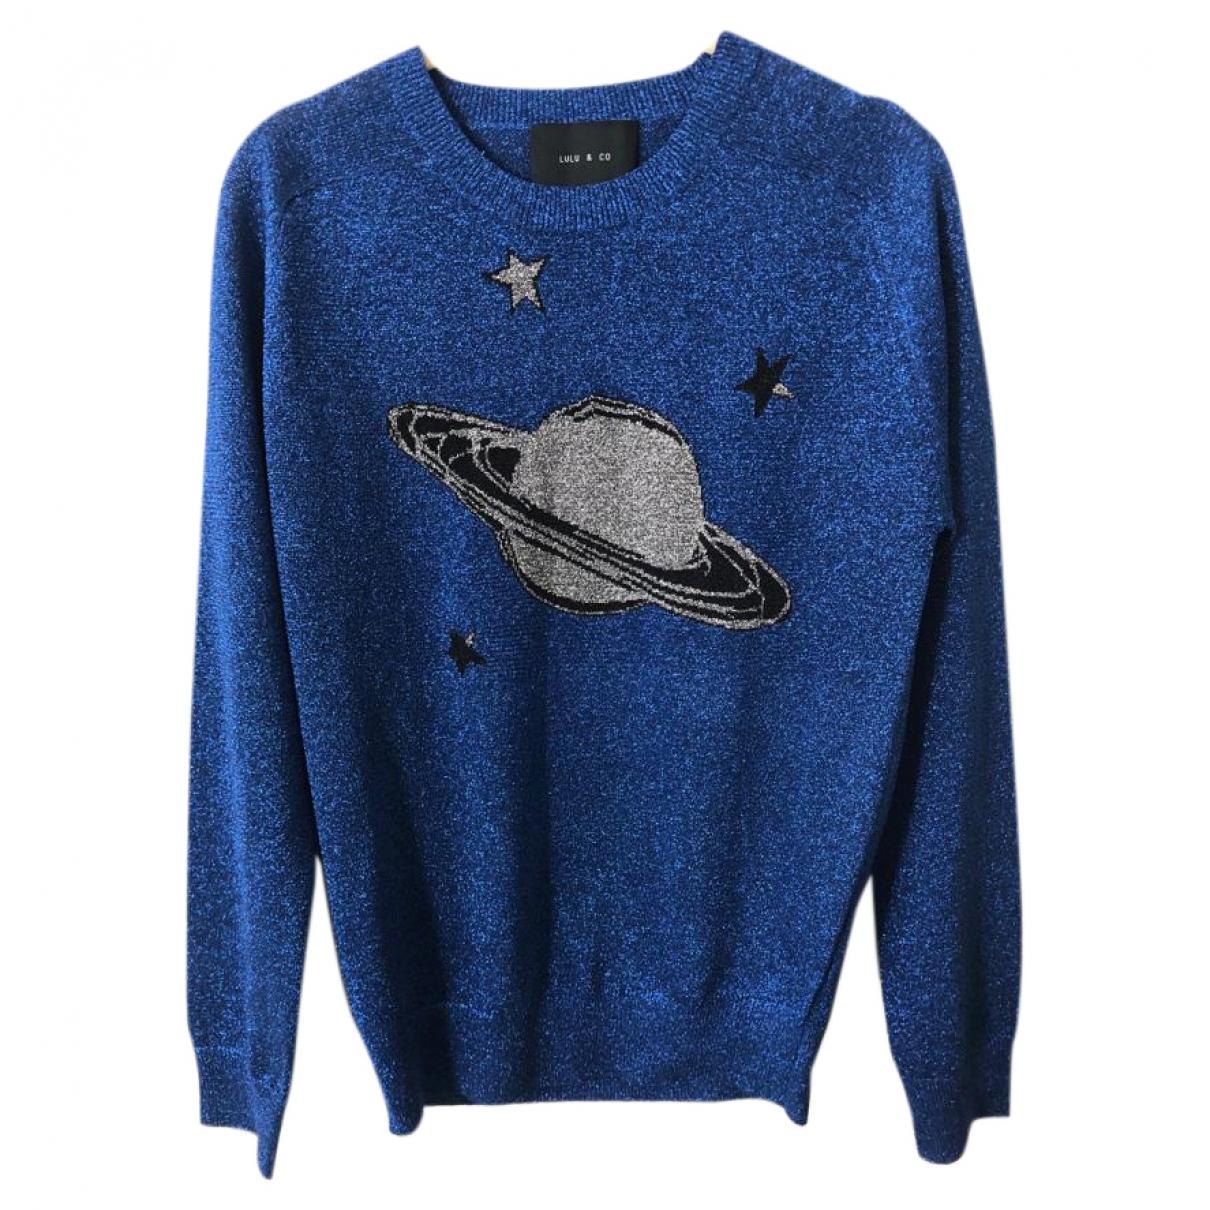 Lulu & Co \N Pullover in  Blau Polyester